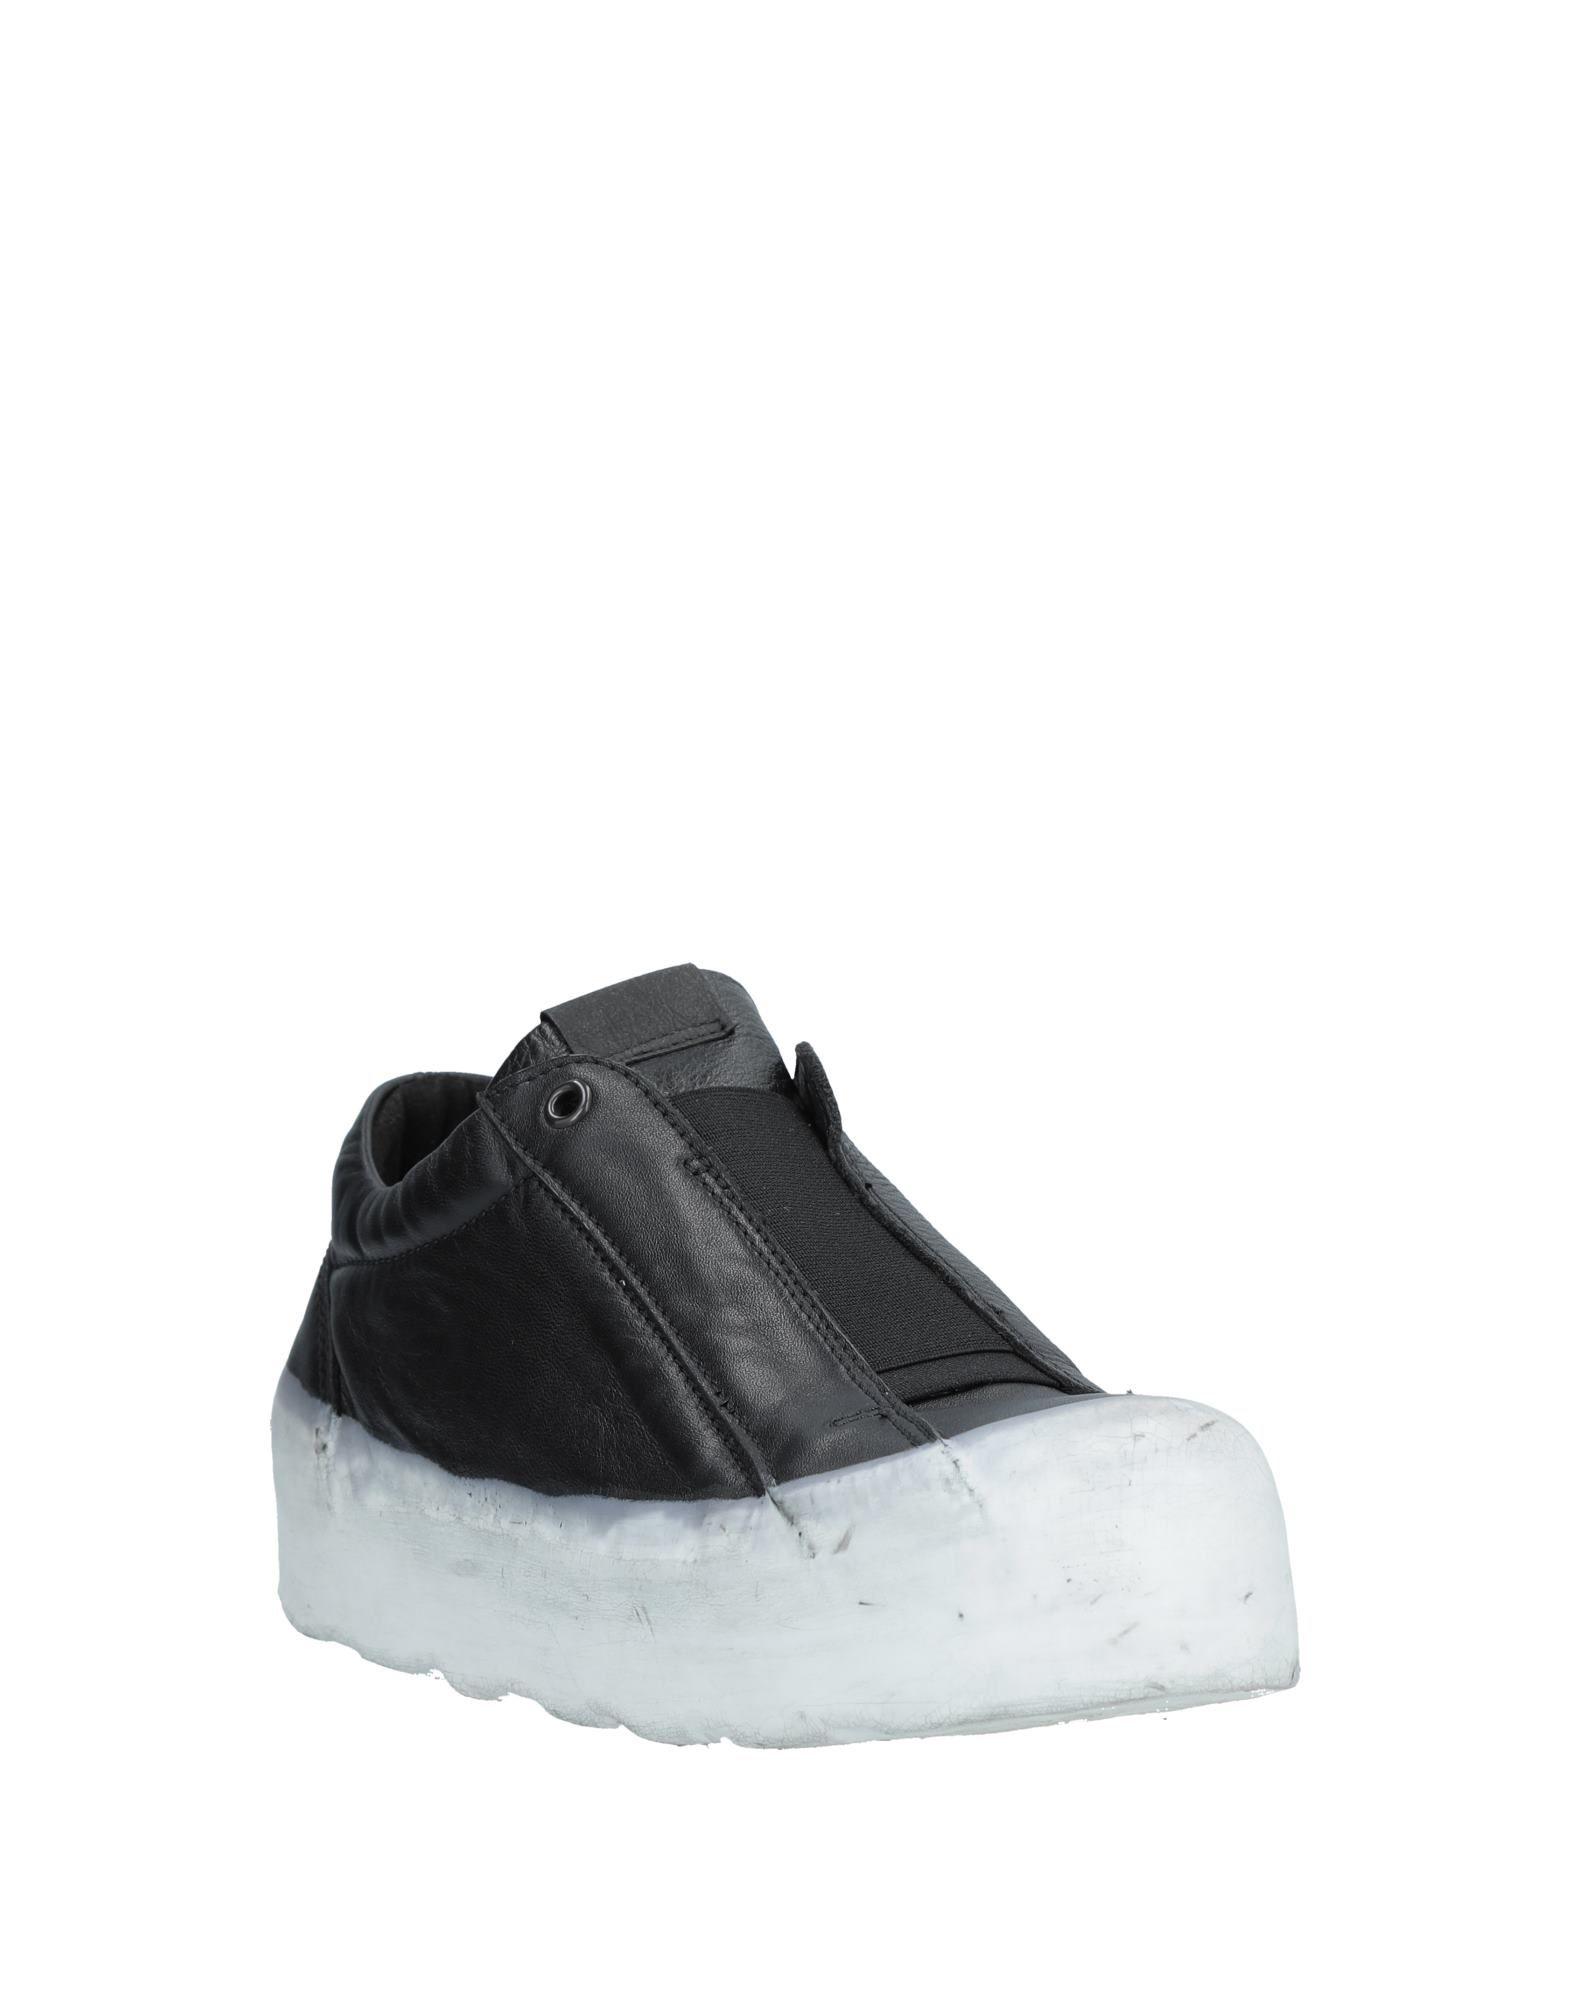 O.X.S. Rubber Soul aussehende Sneakers Damen  11497718DXGut aussehende Soul strapazierfähige Schuhe f56991